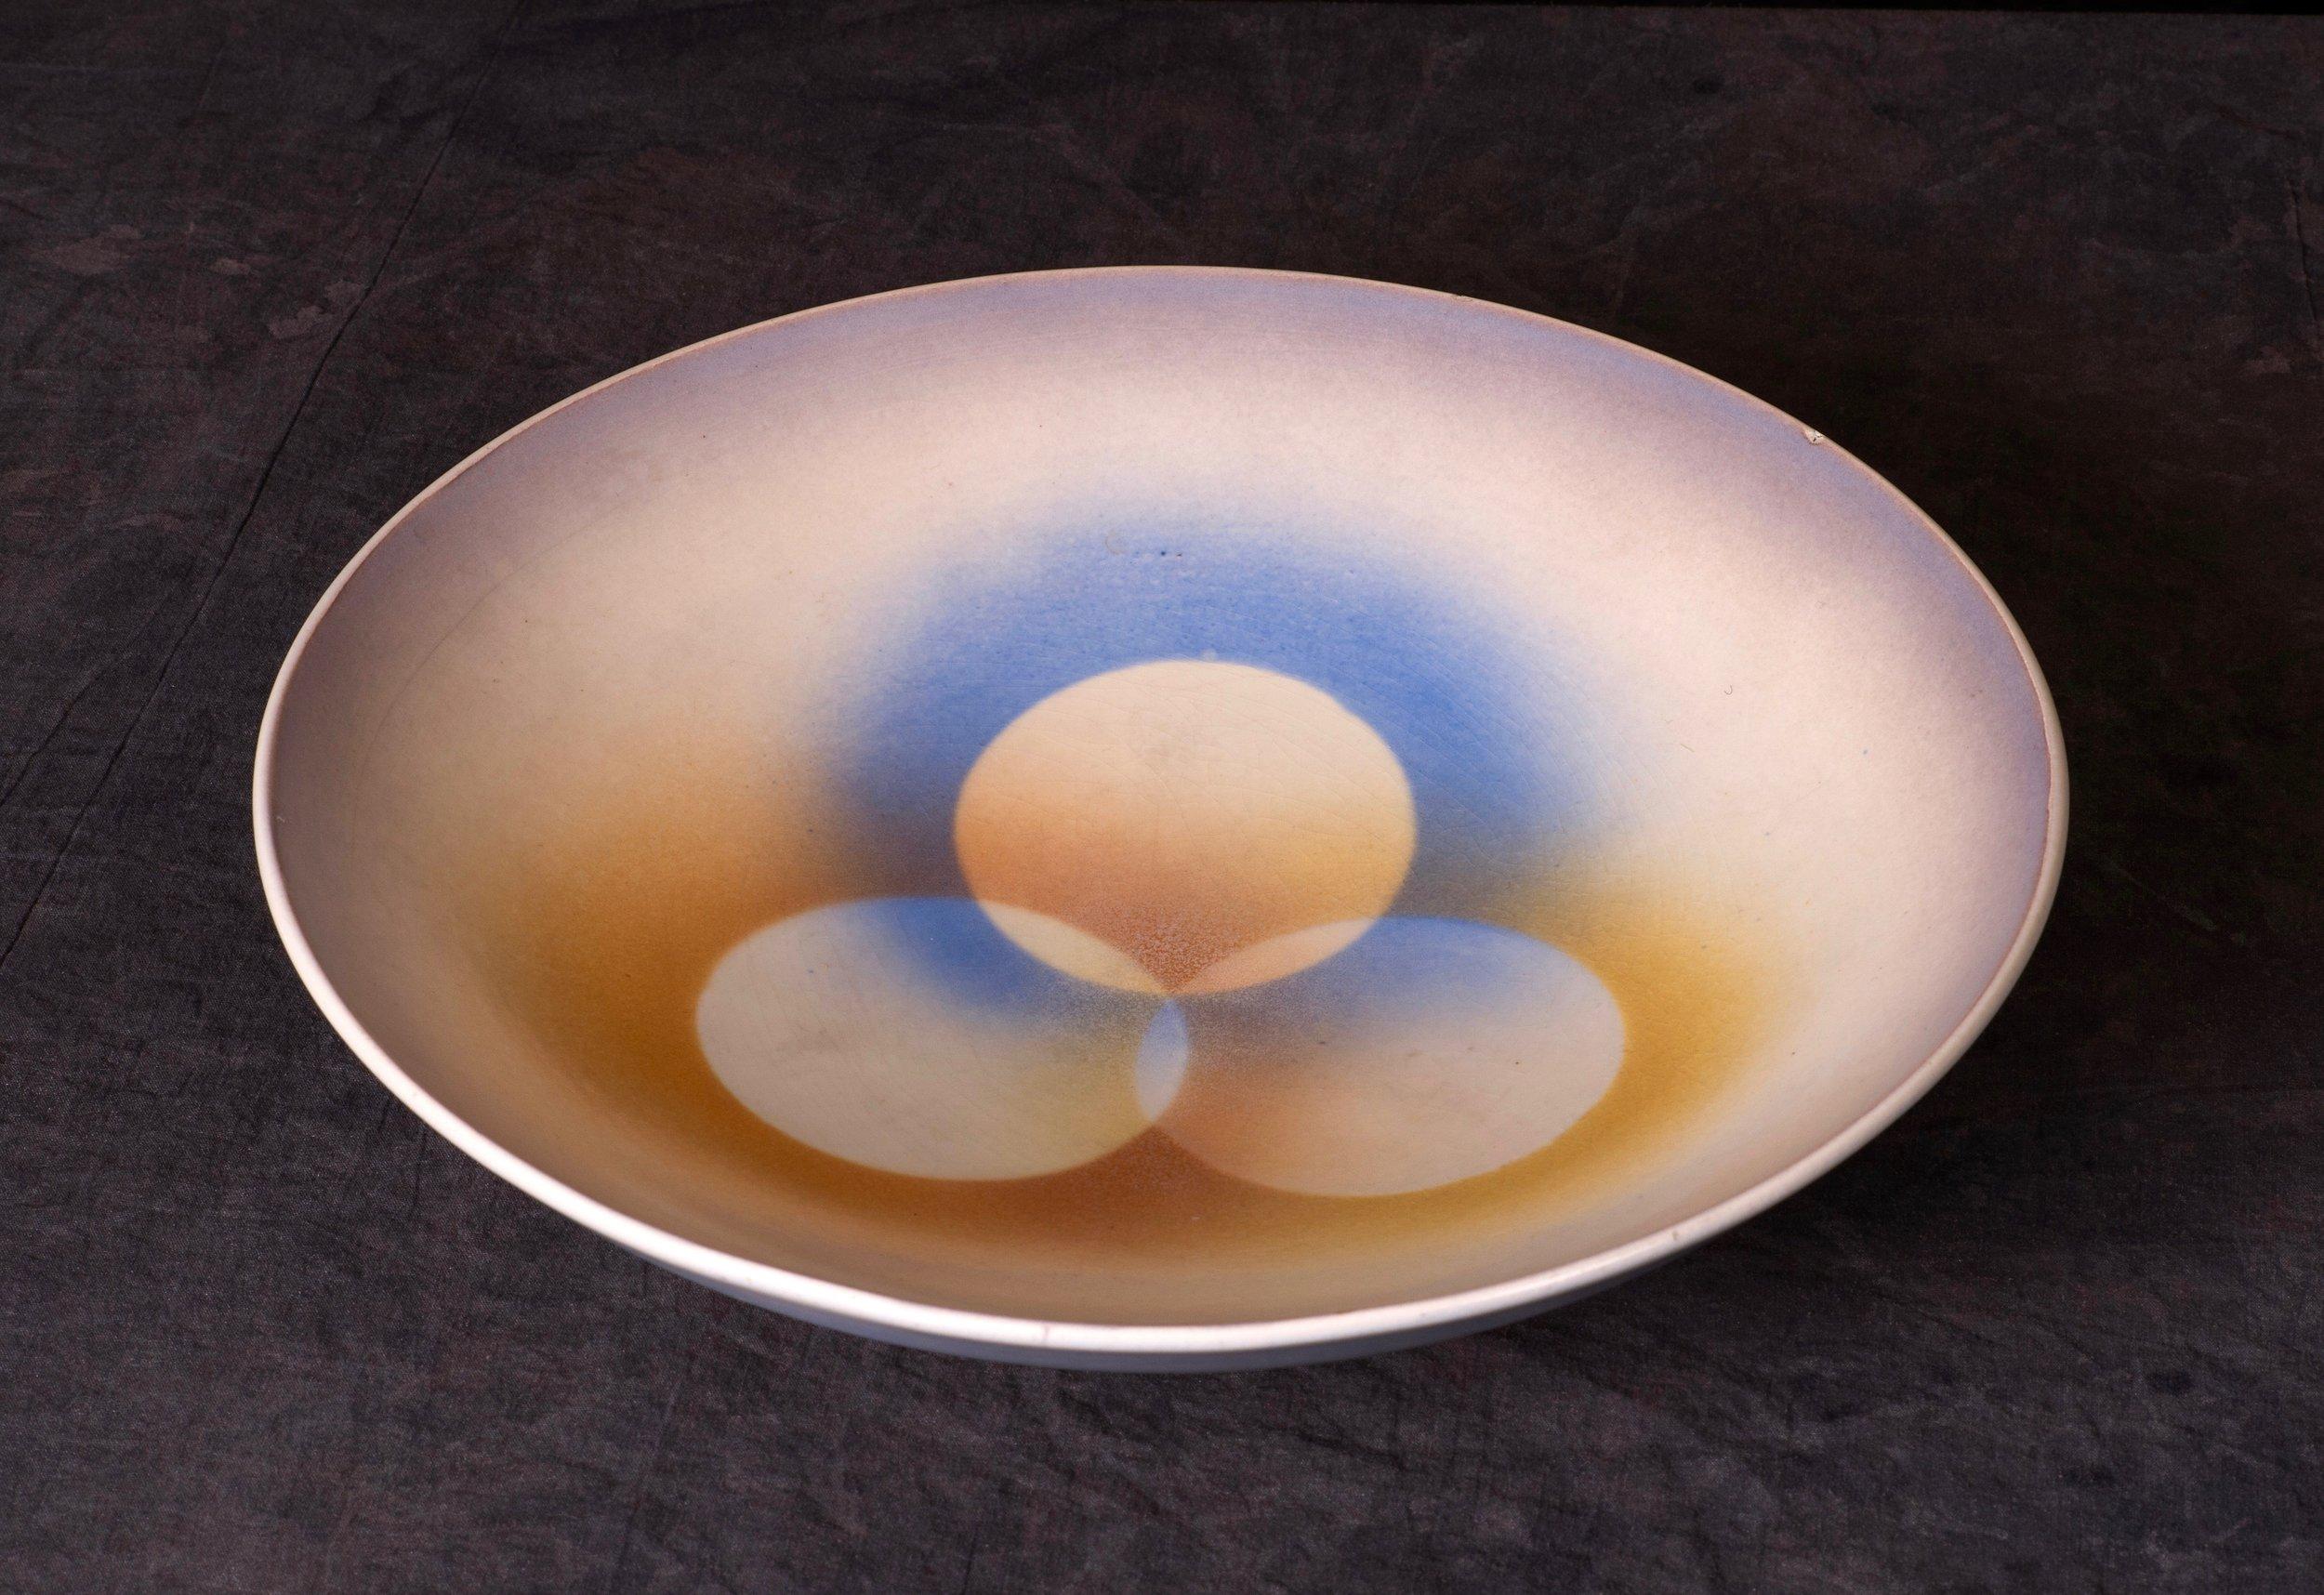 #108 Bowl, form 3120, dec.58, Karlsruhe. Form and decoration by Martha Katzer, 1929, in production 1930-1938. Black 3120/58; 7.5 cm H, 31.6 cm Ø. RM2737